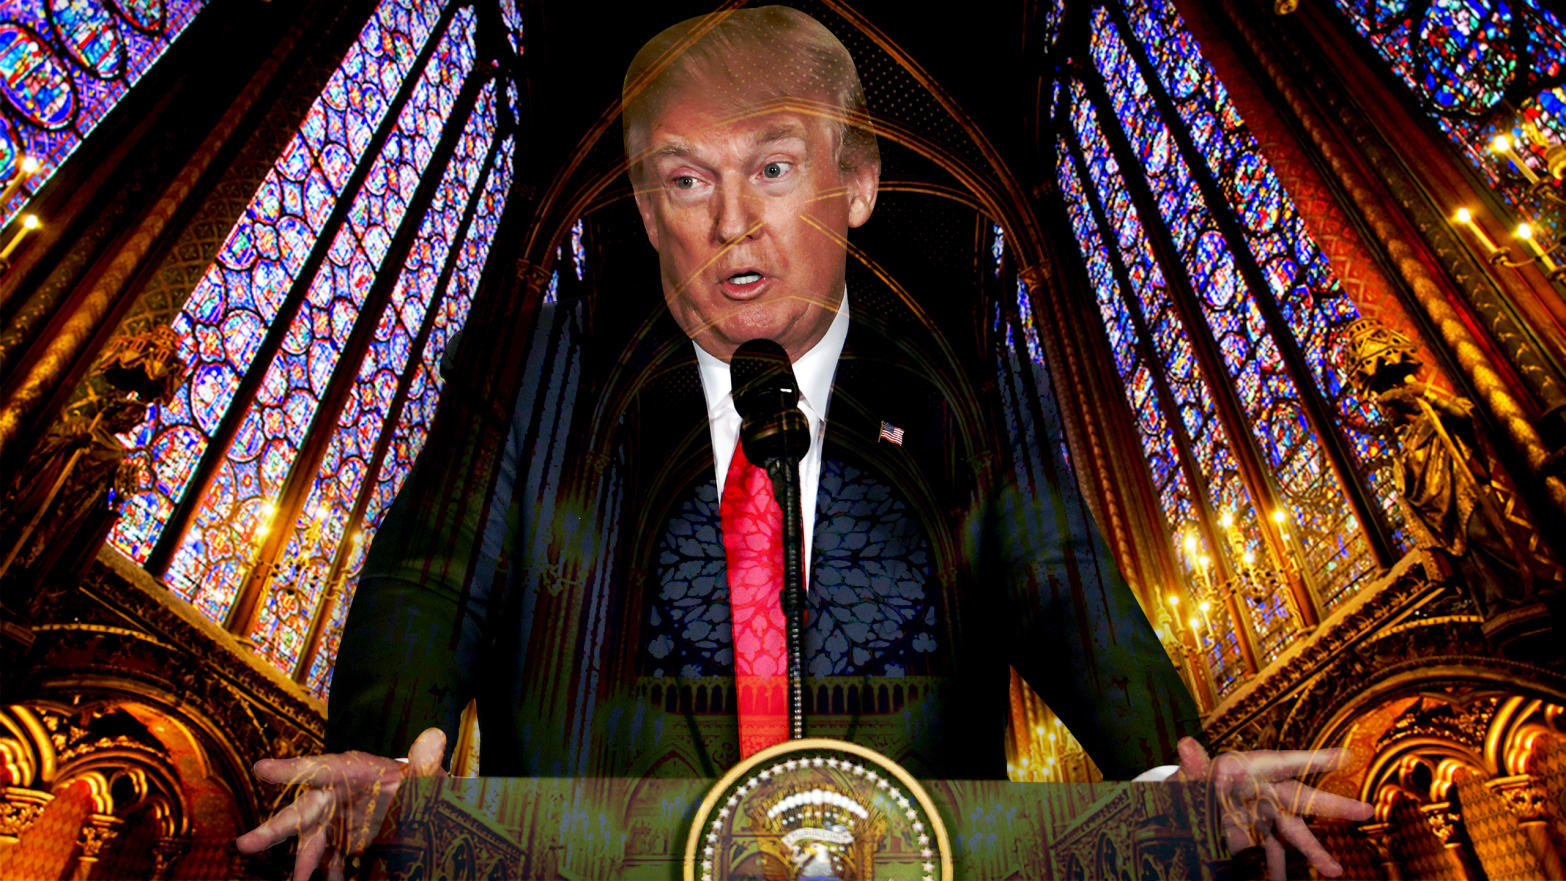 https://img.thedailybeast.com/image/upload/c_crop,d_placeholder_euli9k,h_1440,w_2560,x_0,y_0/dpr_1.5/c_limit,w_1044/fl_lossy,q_auto/v1519490704/120224-NELSON-The_President_s_Fake_Faith-hero_latt4e